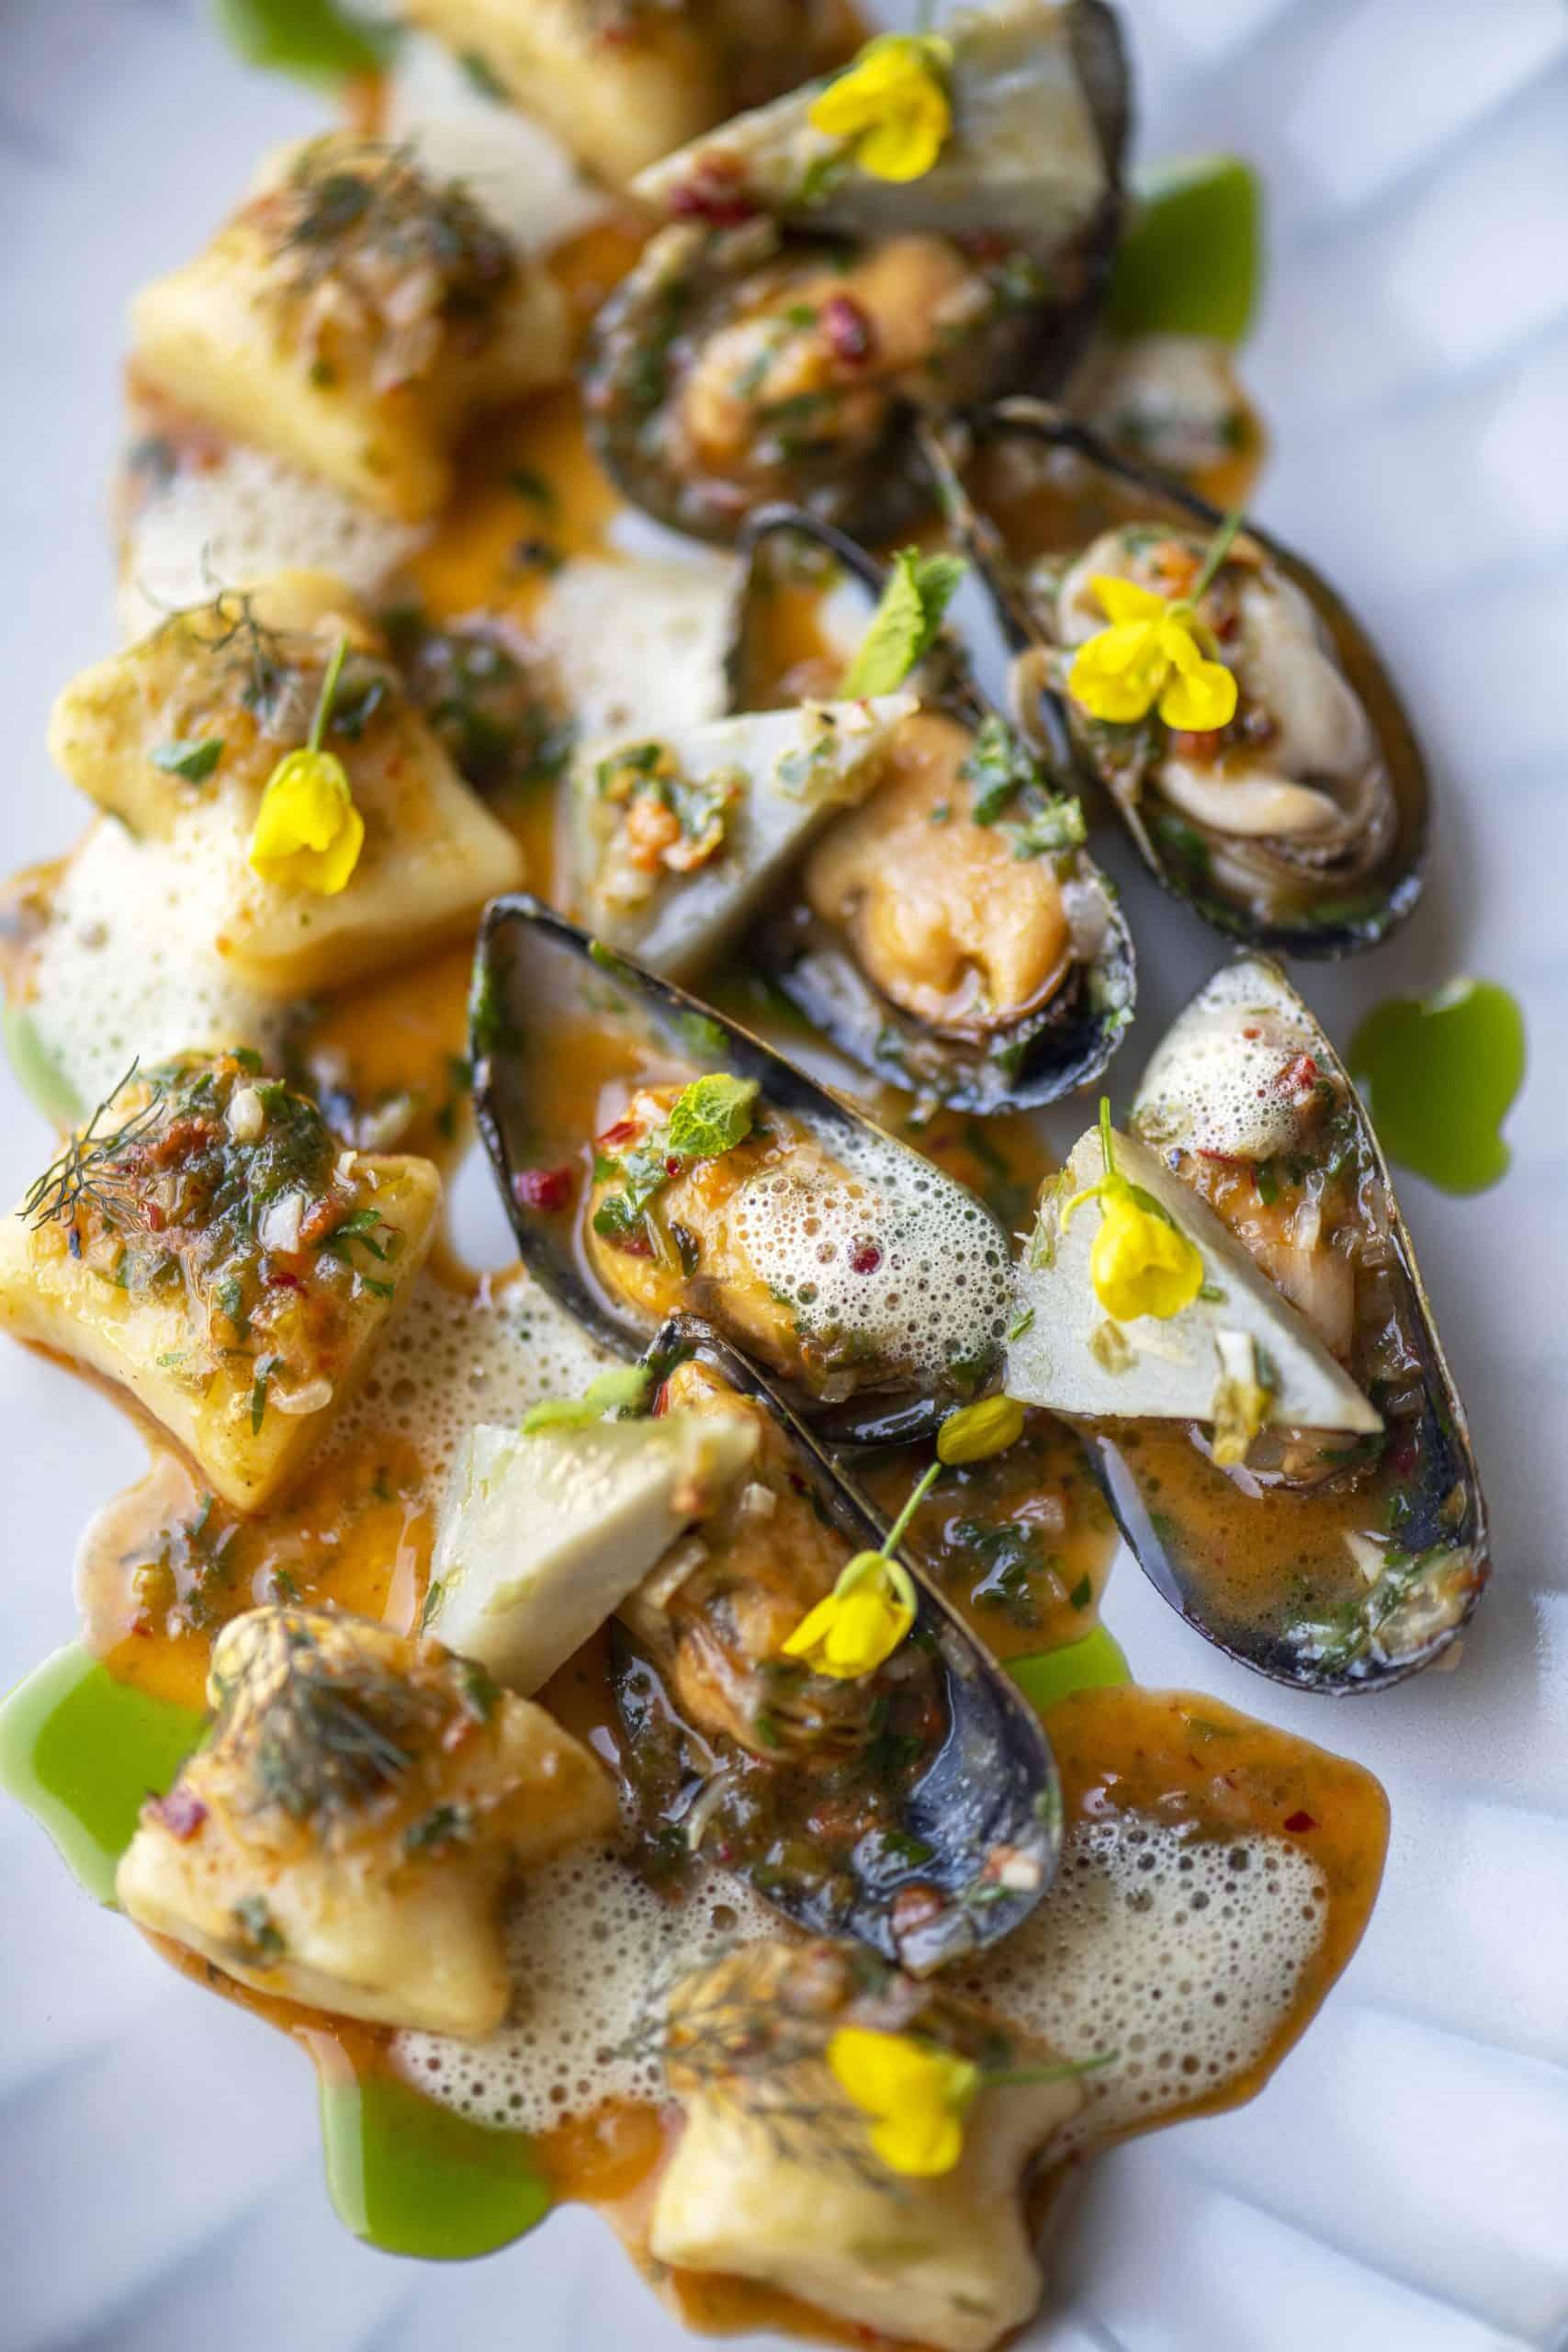 Le_Pristine_restaurant_©_kris_vlegels_024-scaled